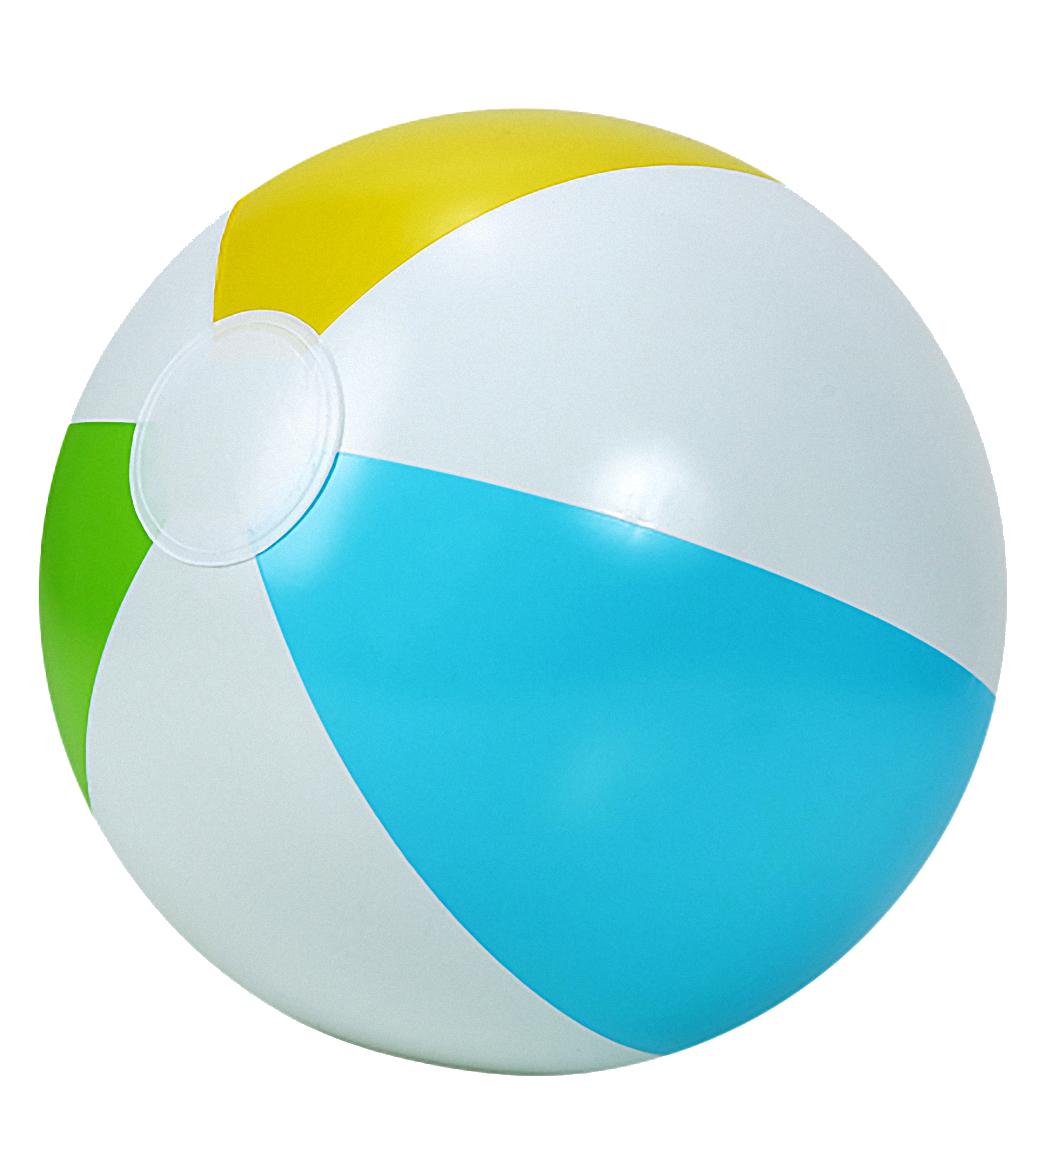 beach ball image - HD1044×1176